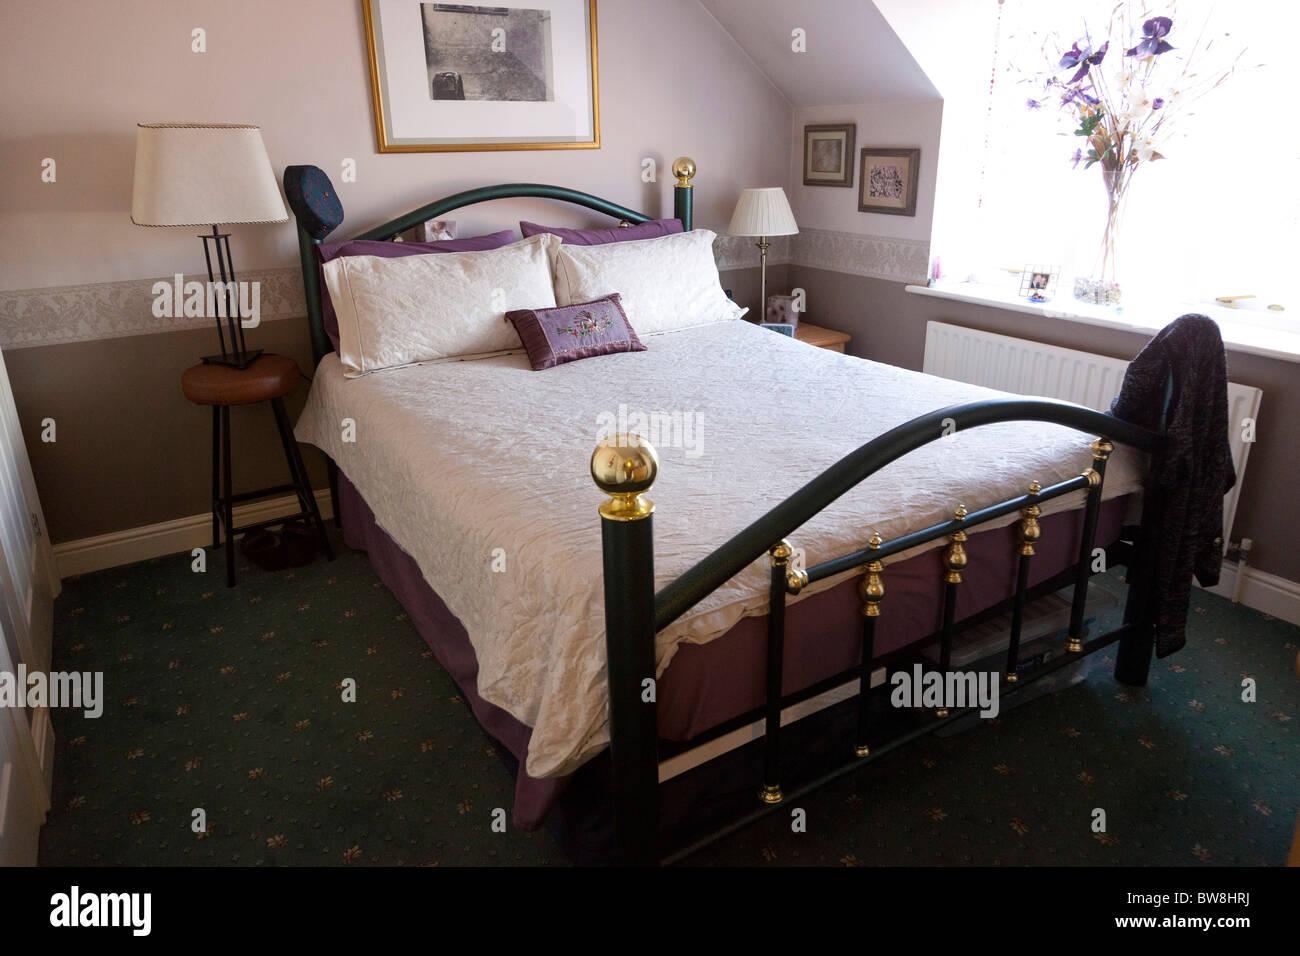 chambre à coucher Photo Stock